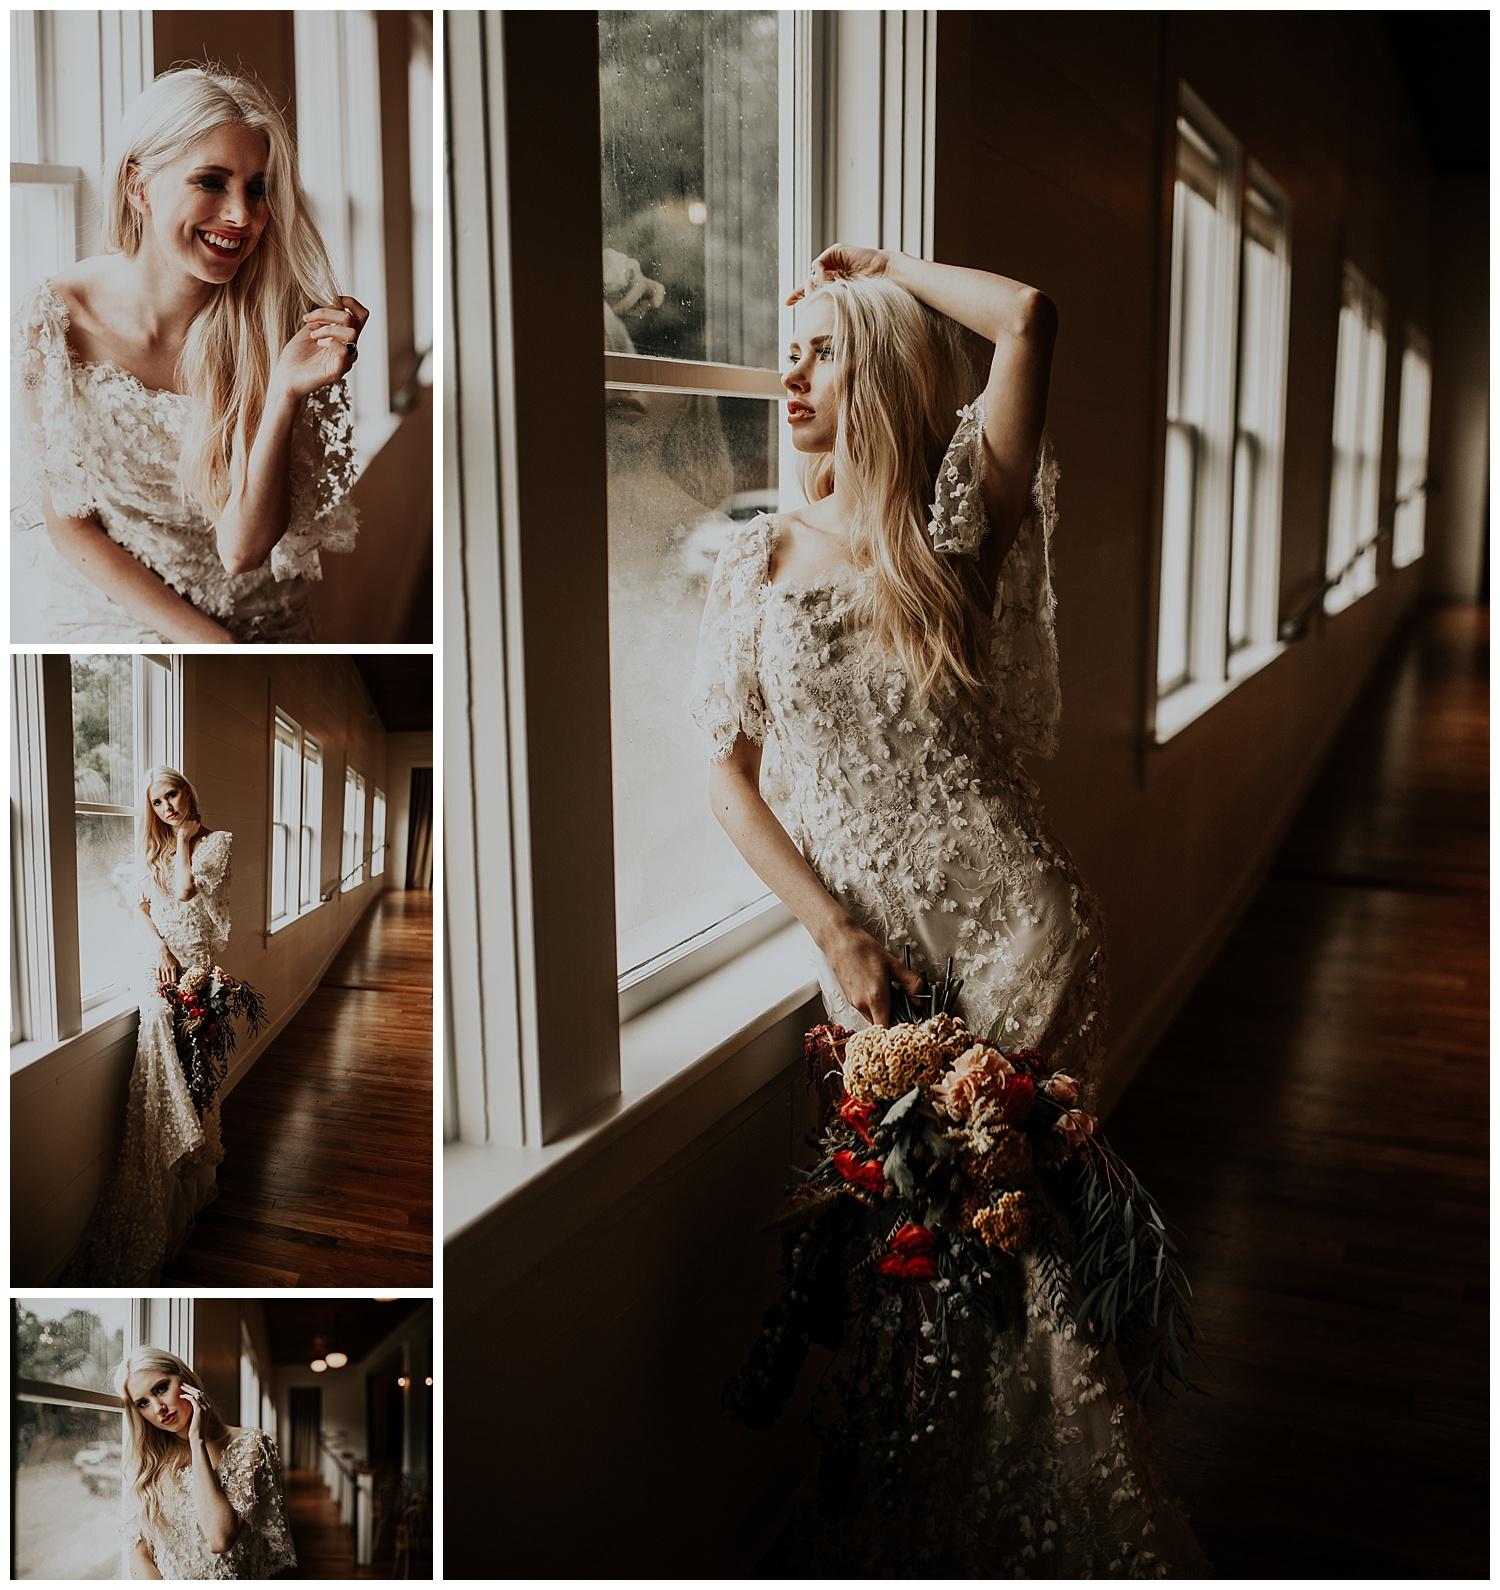 Laken-Mackenzie-Photography-Cliff-House-Dallas-Wedding-Photographer35.jpg